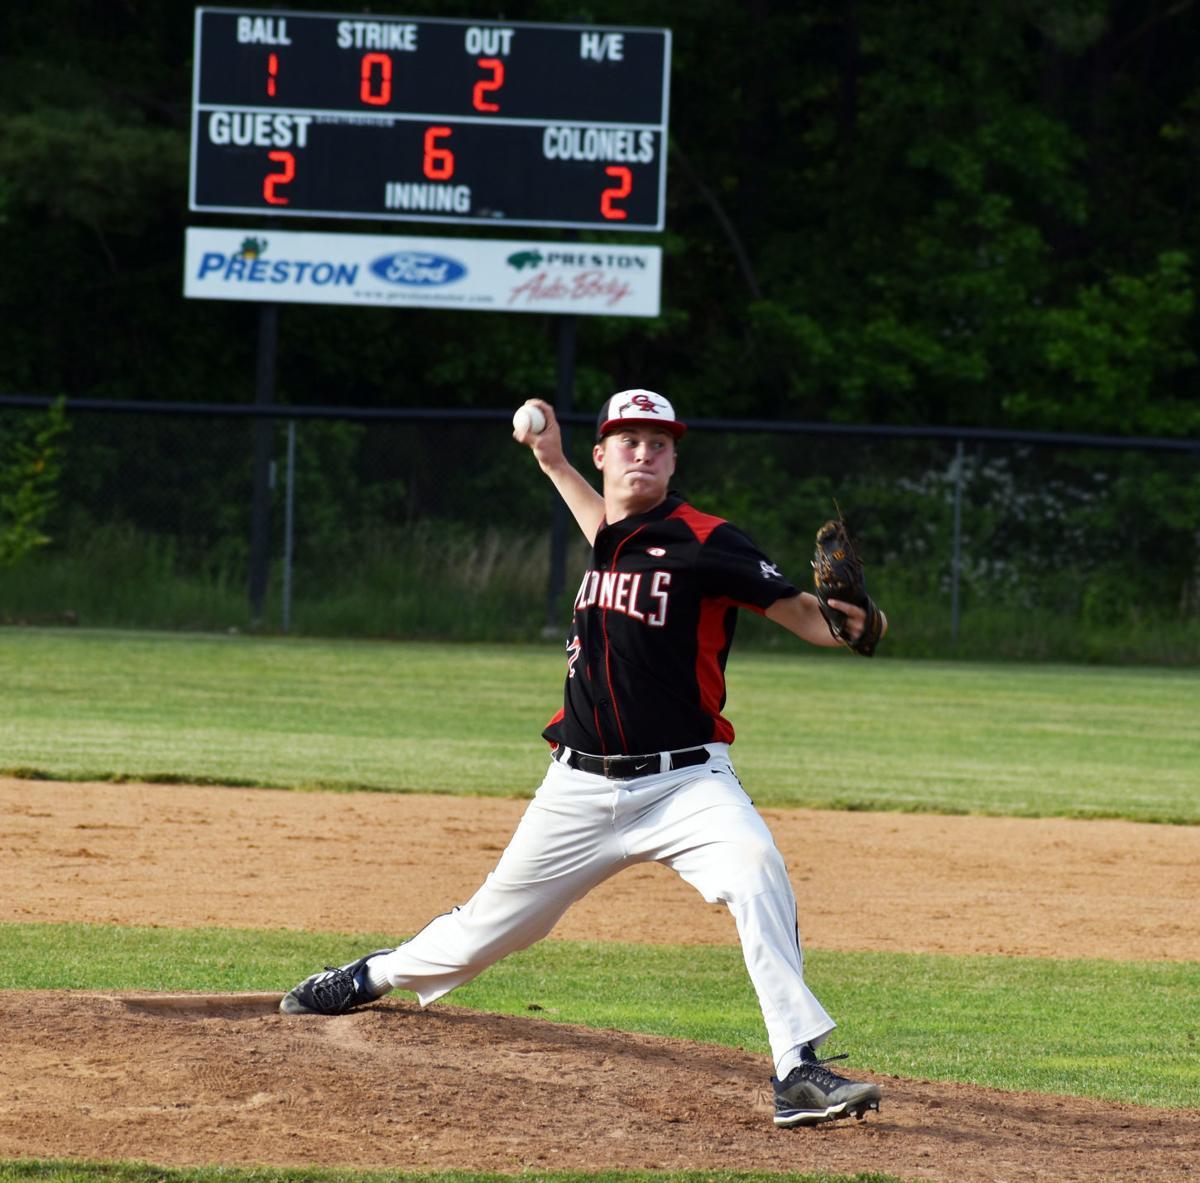 1A East Baseball Championship: Mardela at Colonel Richardson, May 17, 2019